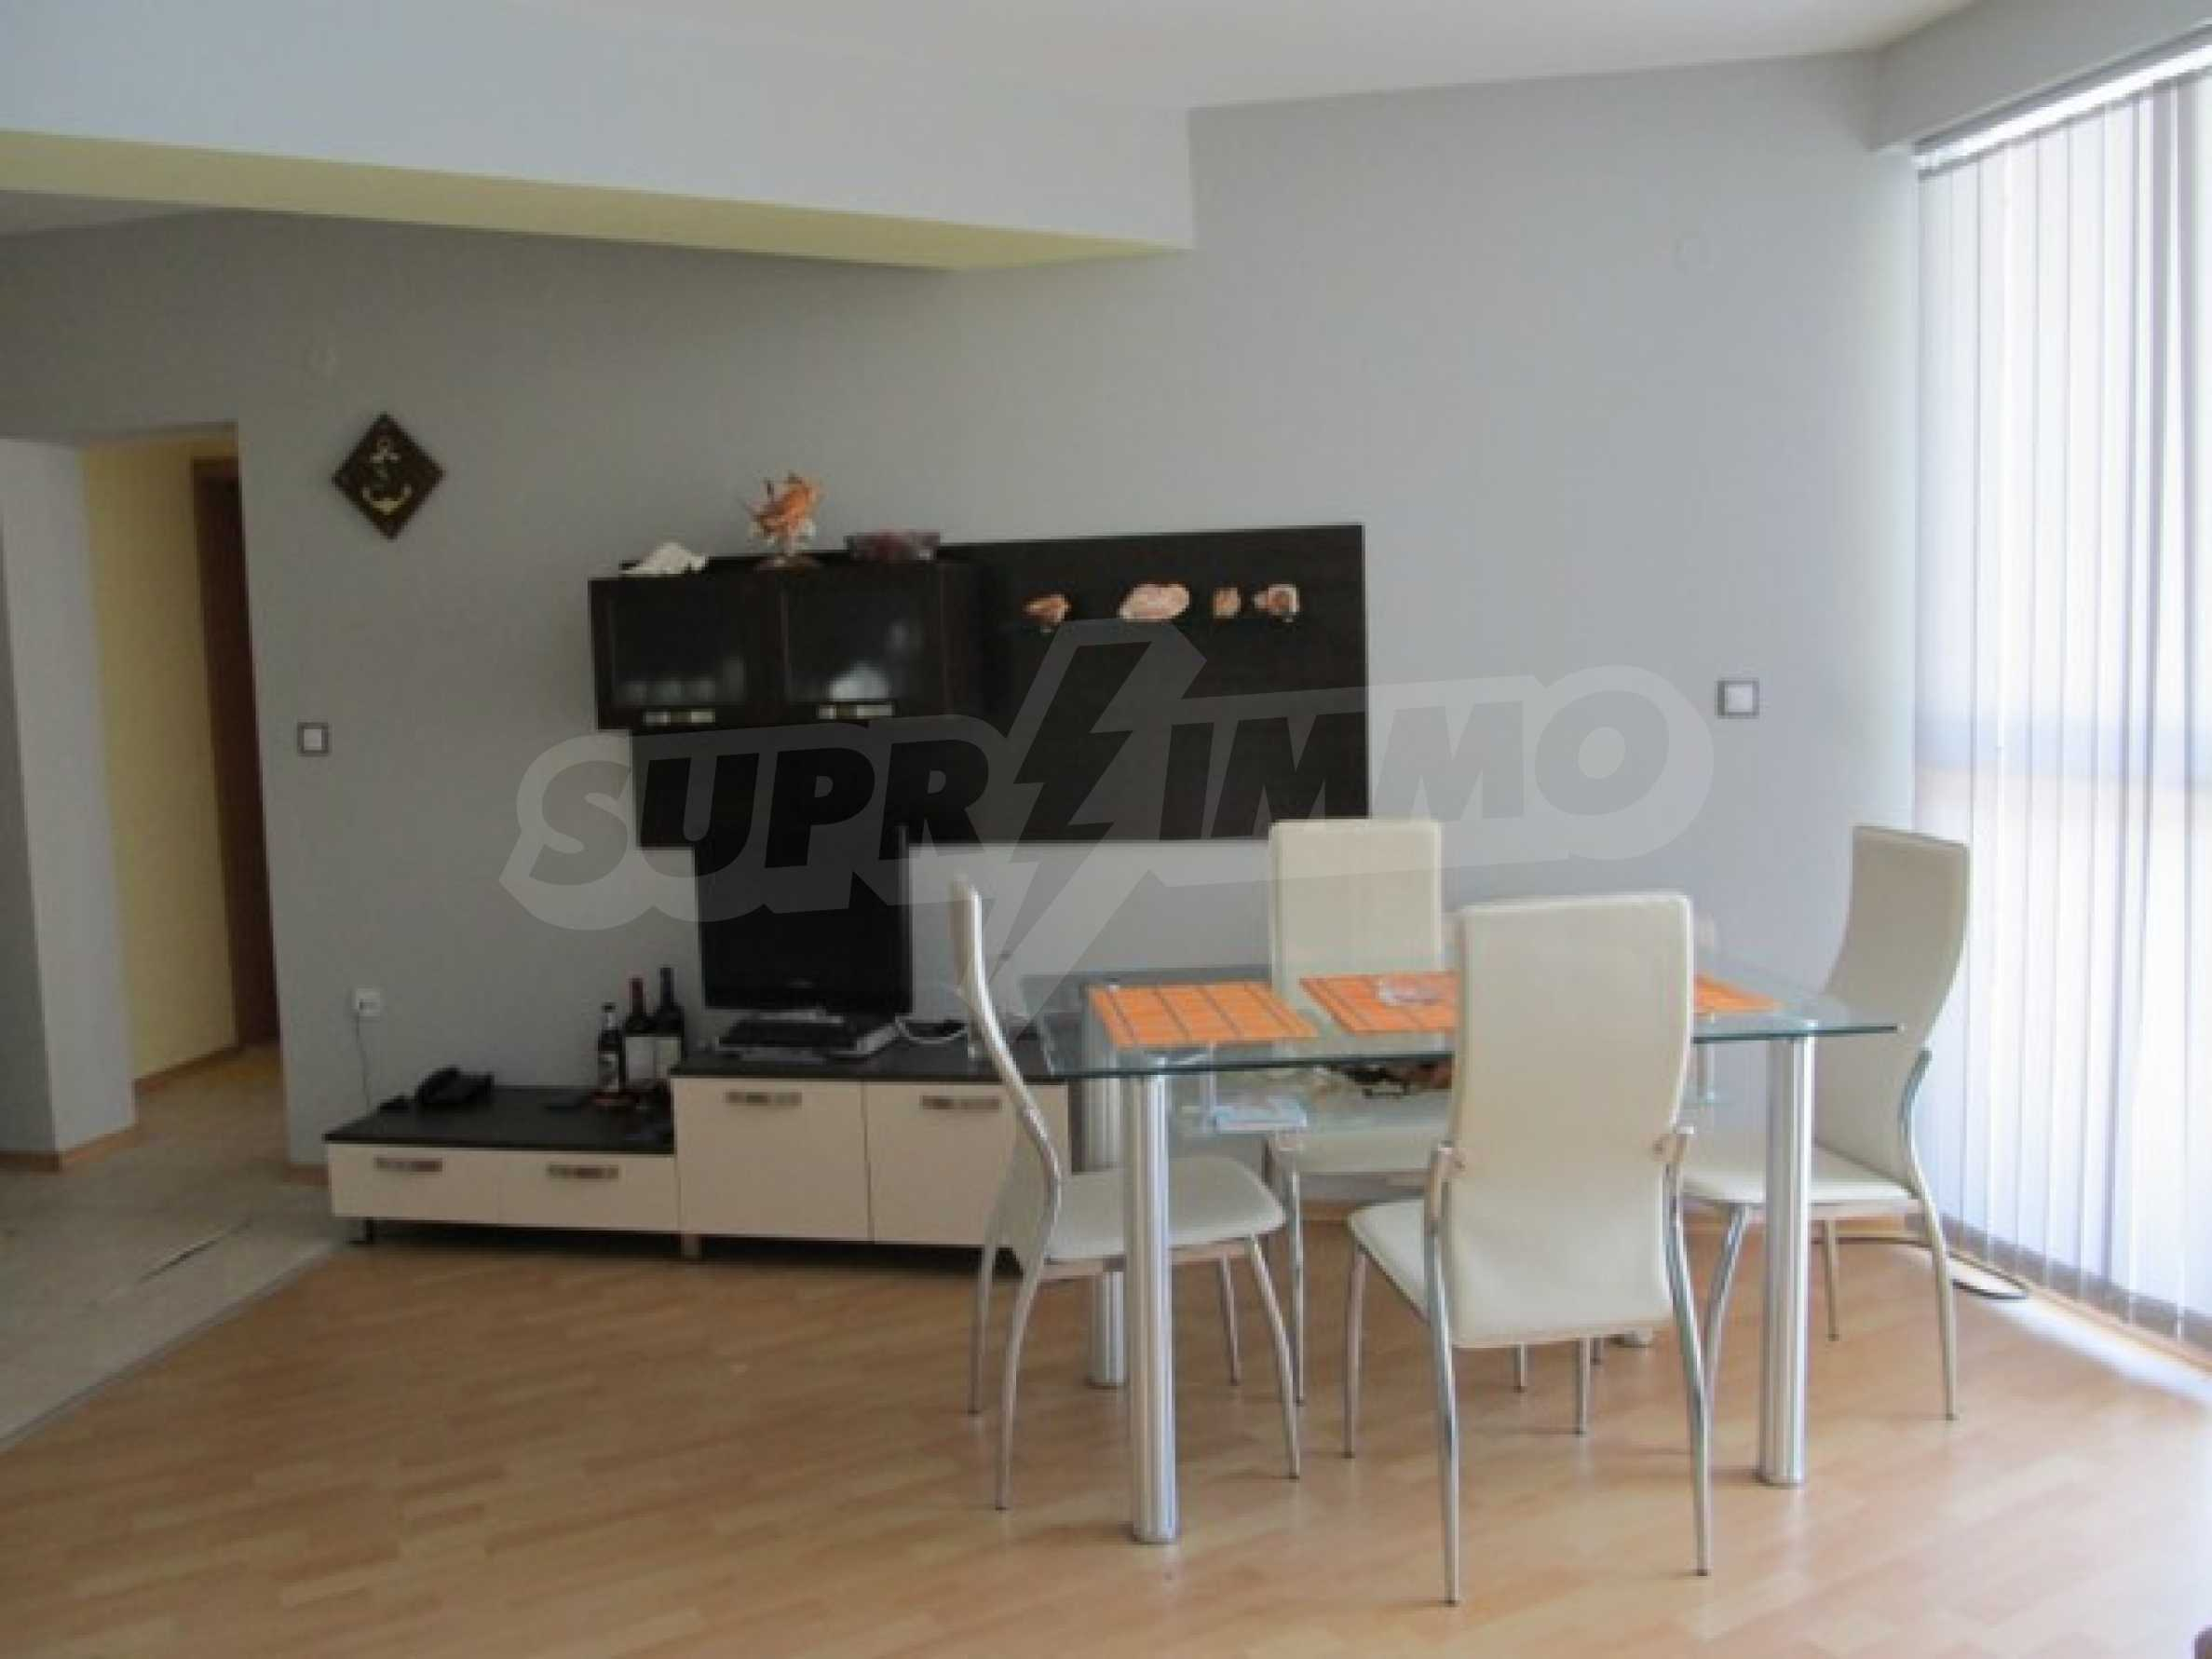 Тристаен апартамент за продажба в Поморие 10